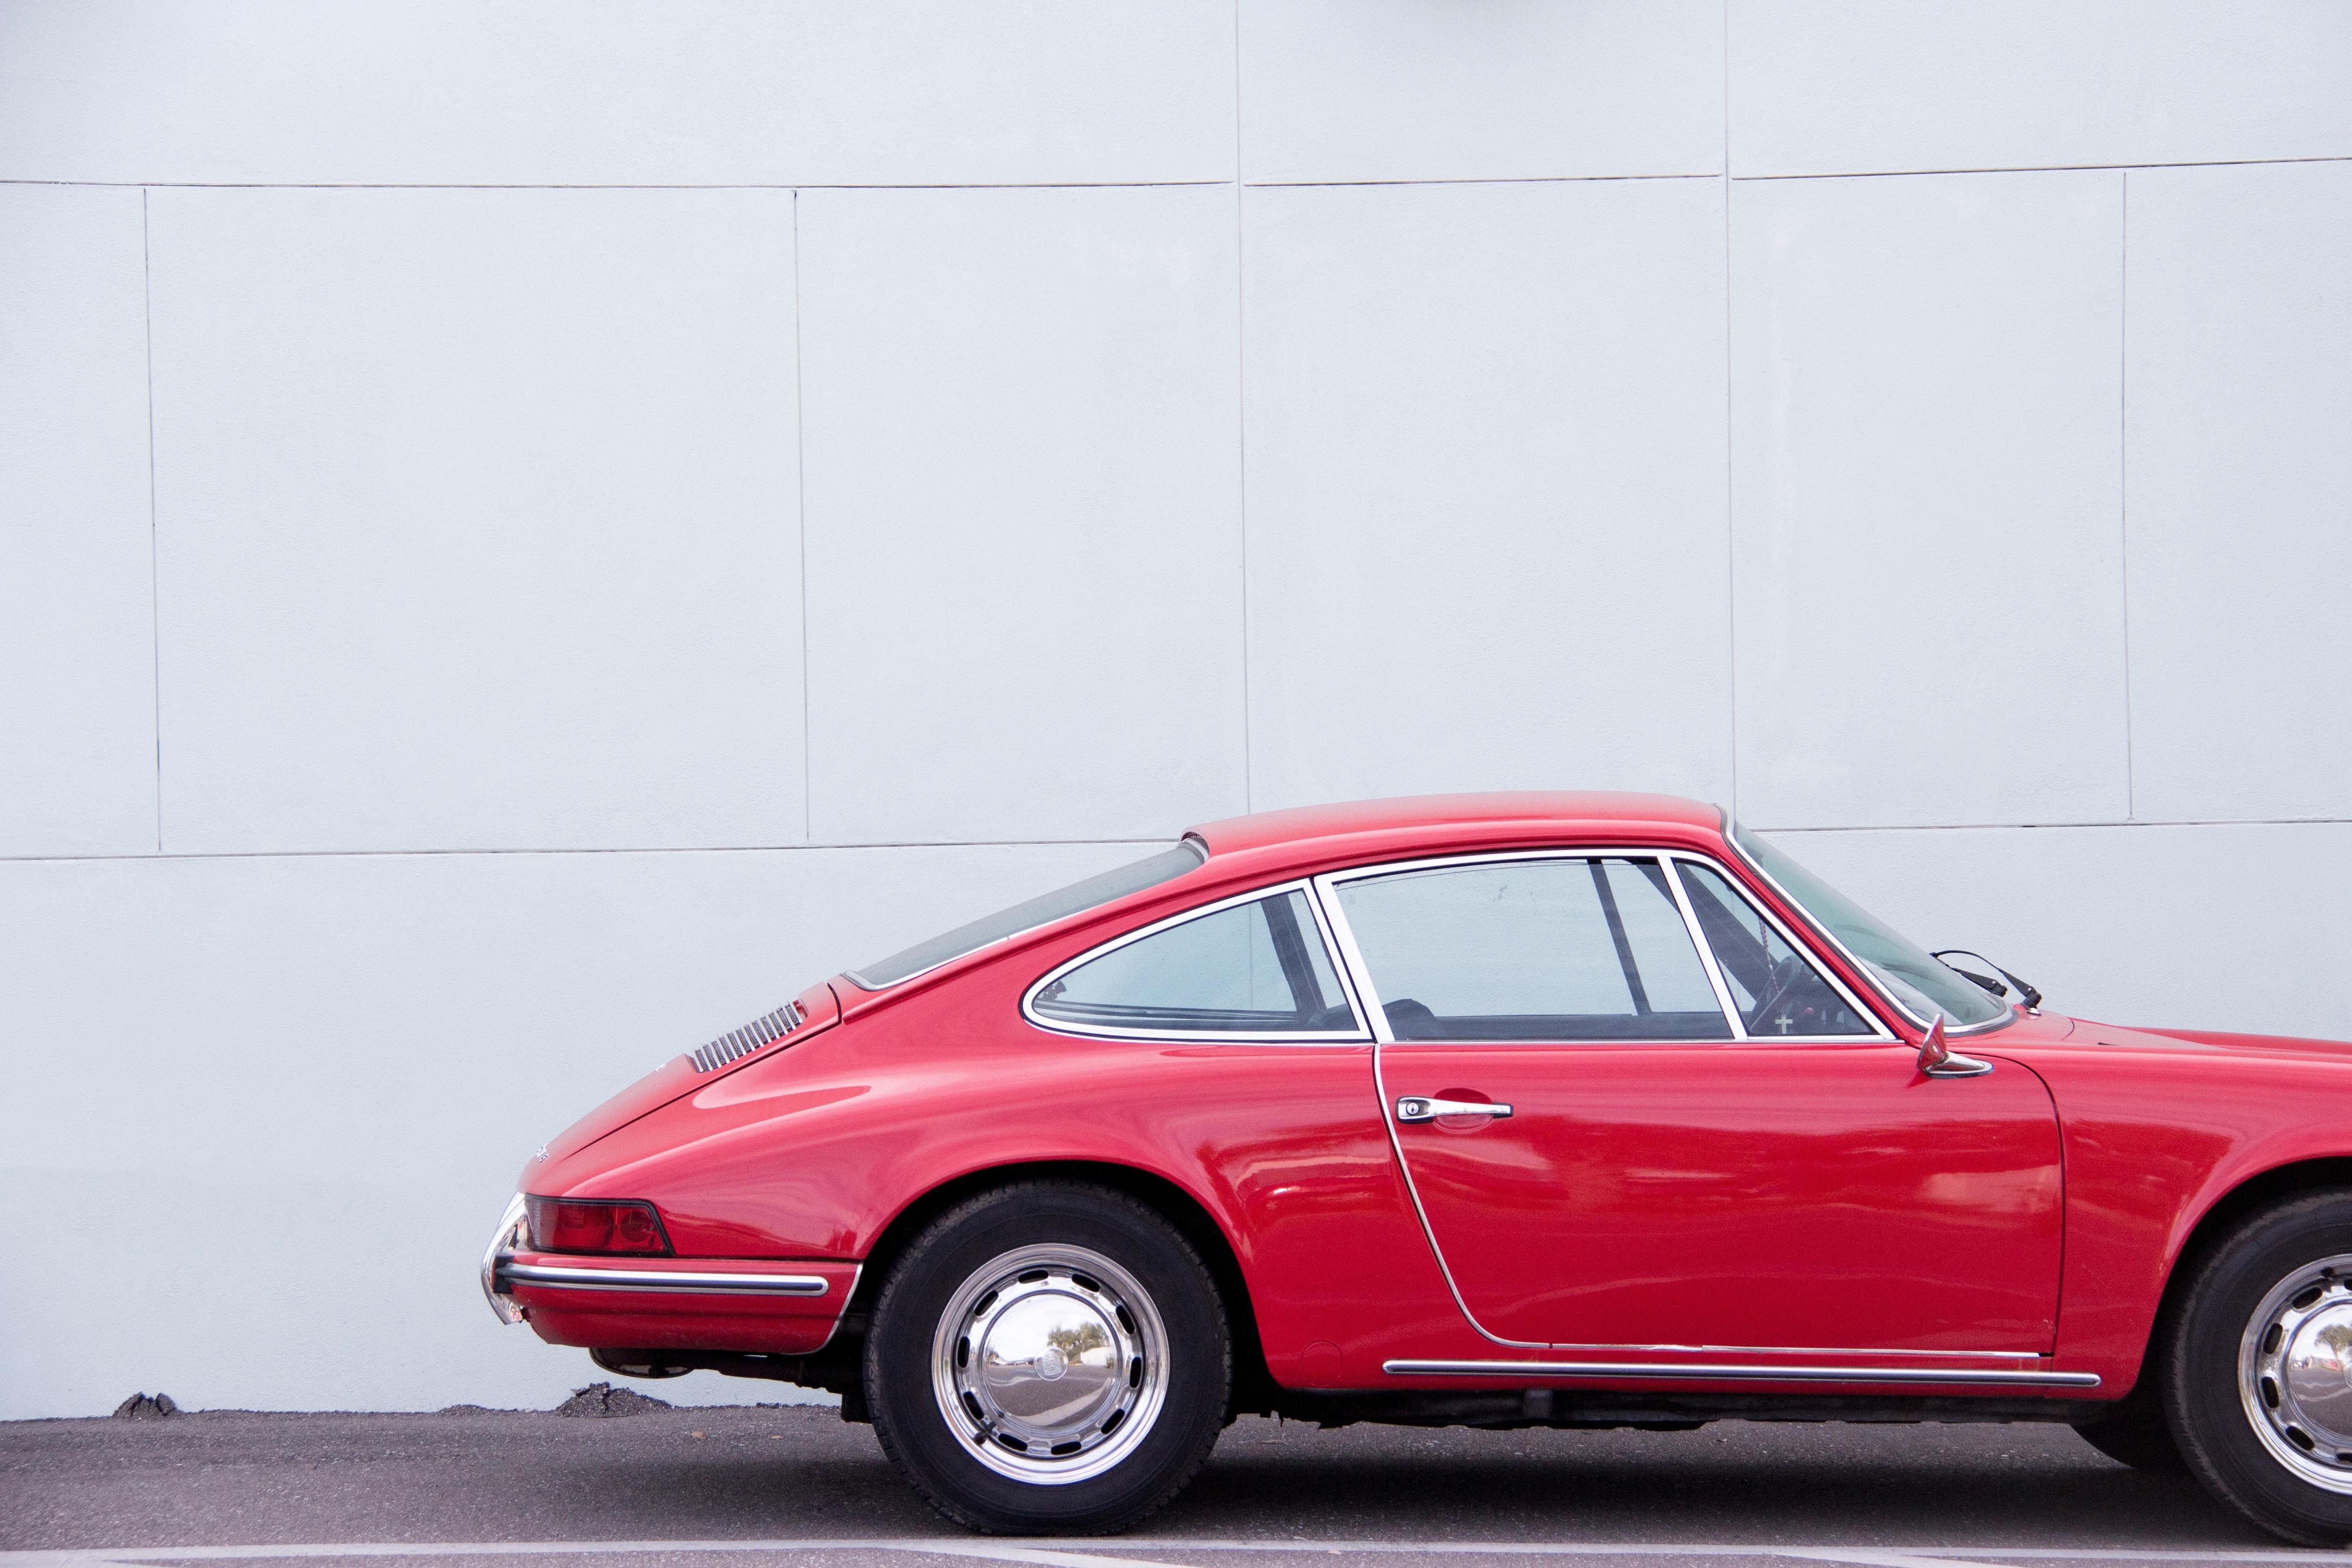 Car Vintage Wheel Red Vehicle Classic Sports Convertible Coupe Porsche Land 911